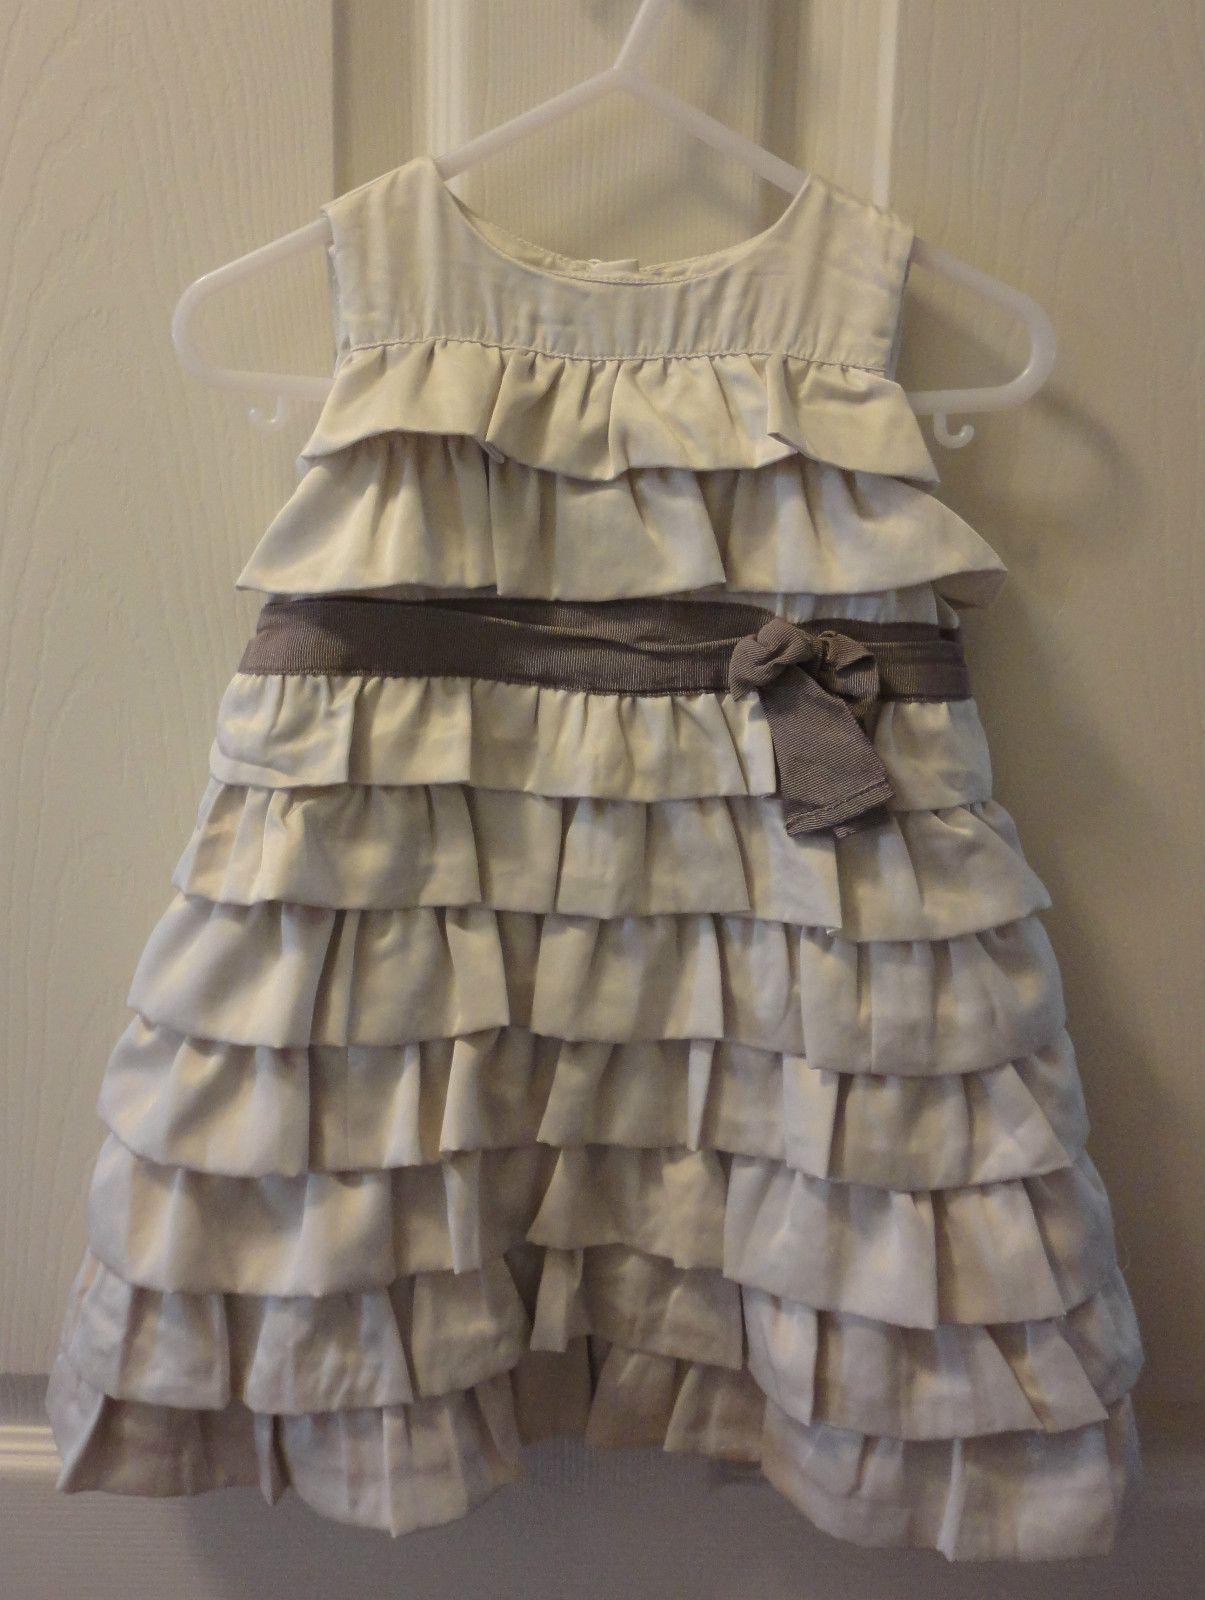 Beautiful Baby Gap Dress Size 18 24 Months Worn Once | eBay